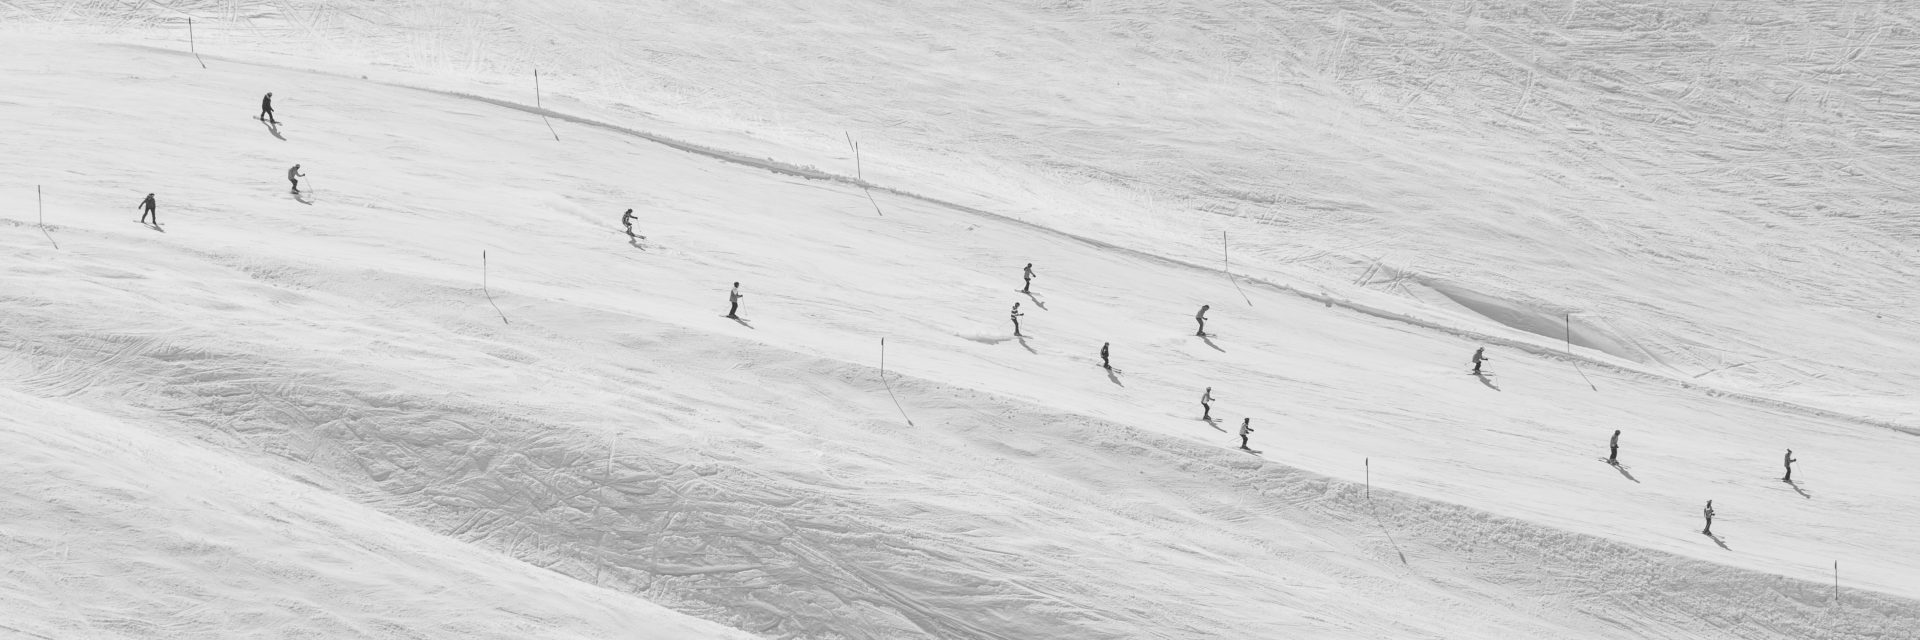 Arlberg Ski resort